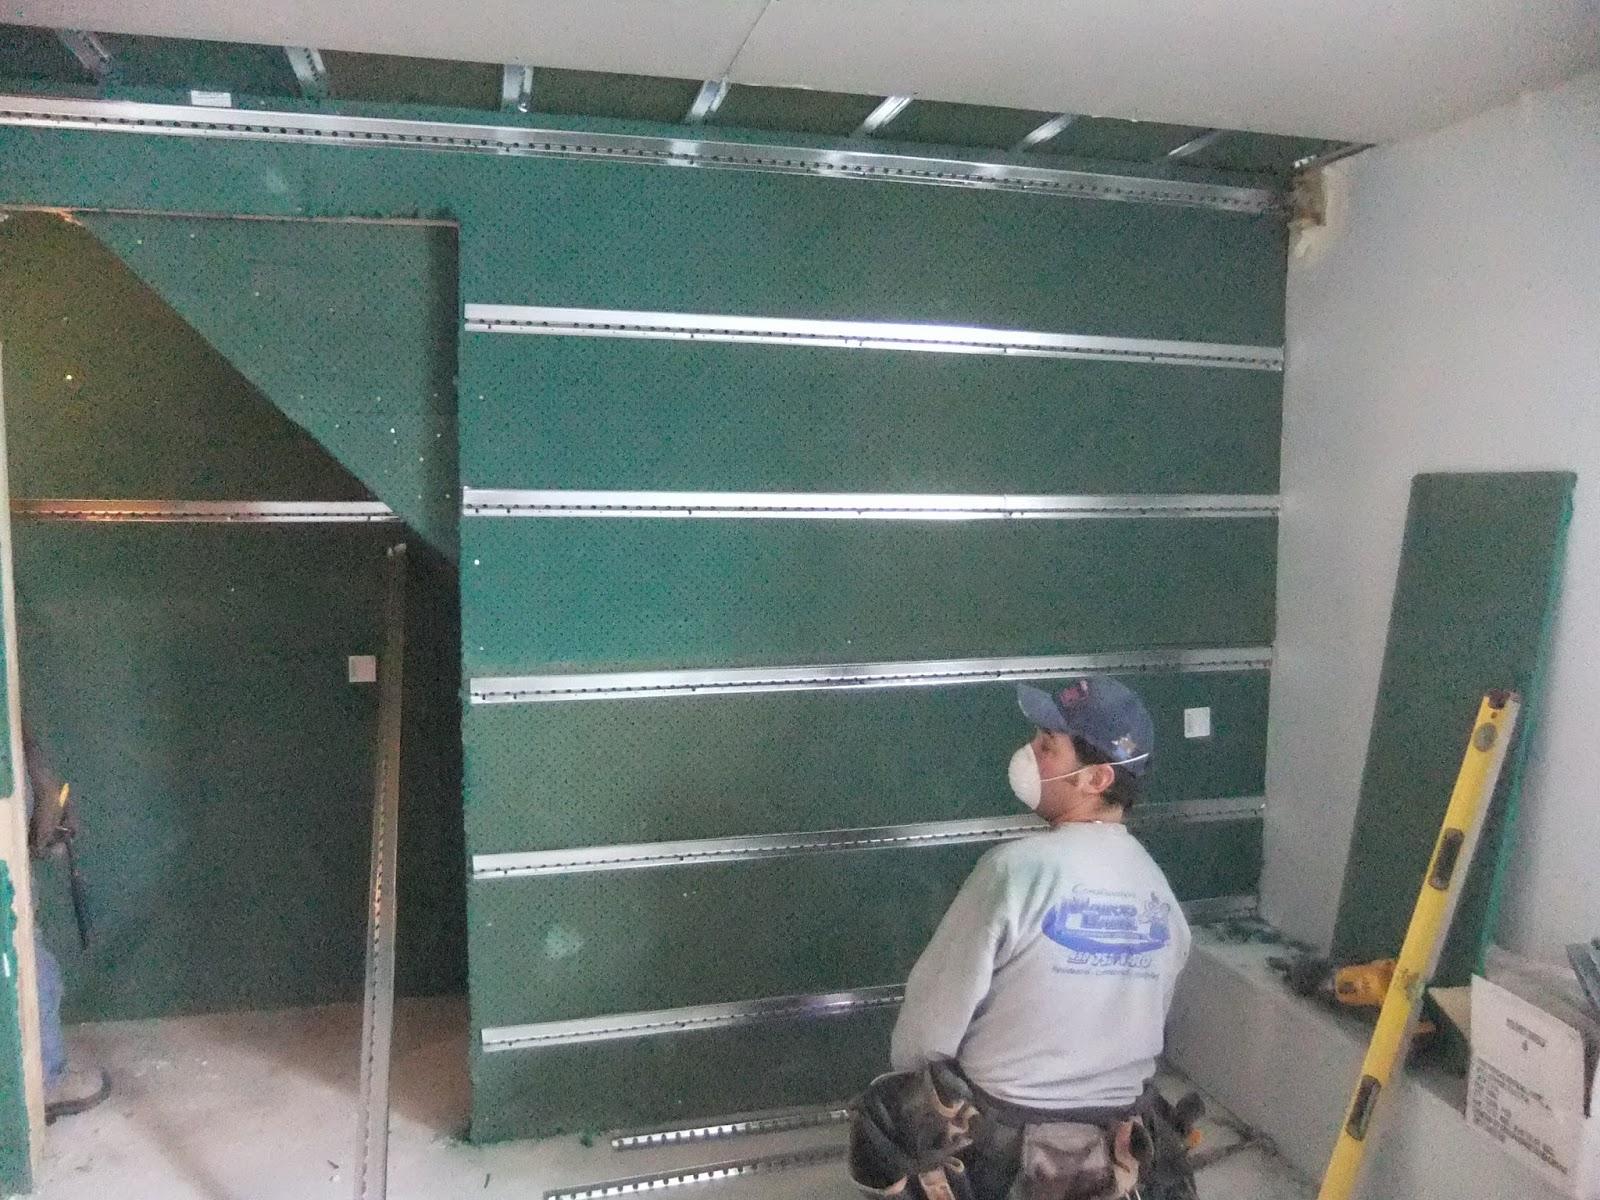 insonoriser un mur insonoriser un mur mitoyen yves. Black Bedroom Furniture Sets. Home Design Ideas